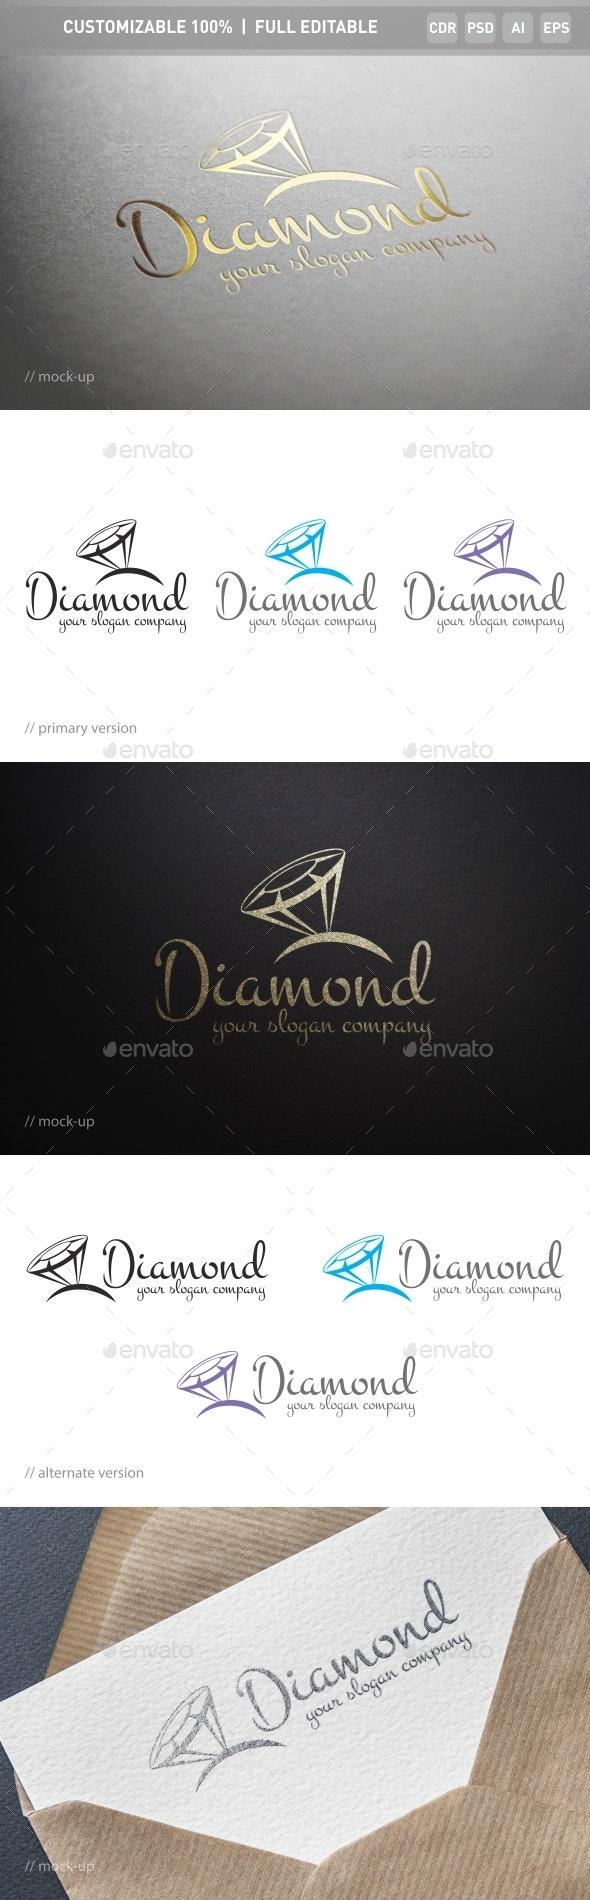 Diamonds Logo Template - Objects Logo Templates